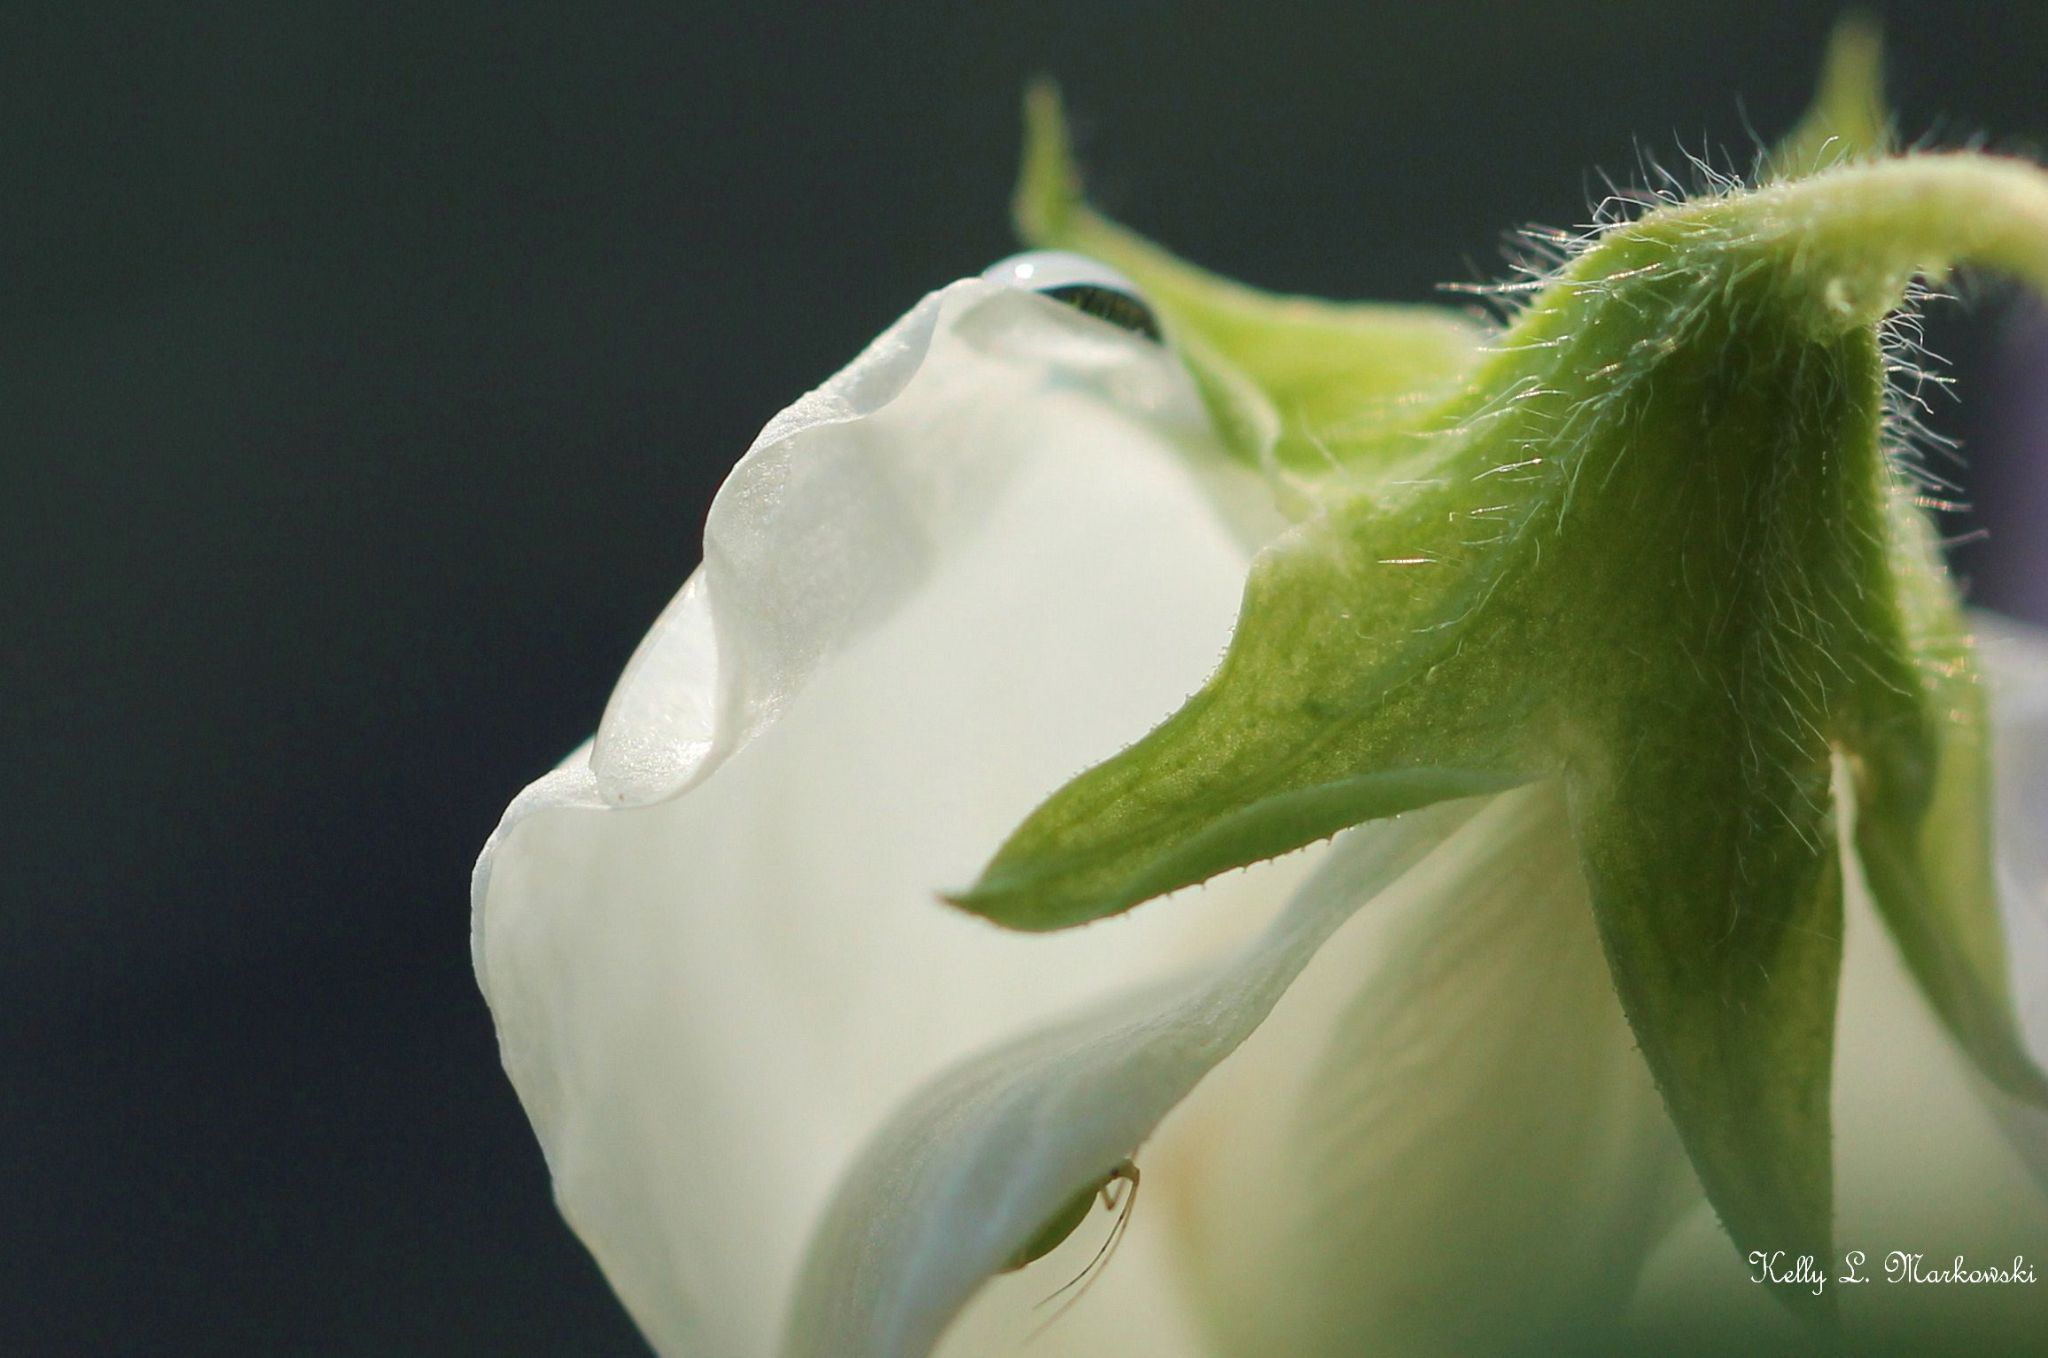 Peeking From Within The Sweet Pea by kelly.markowski.7